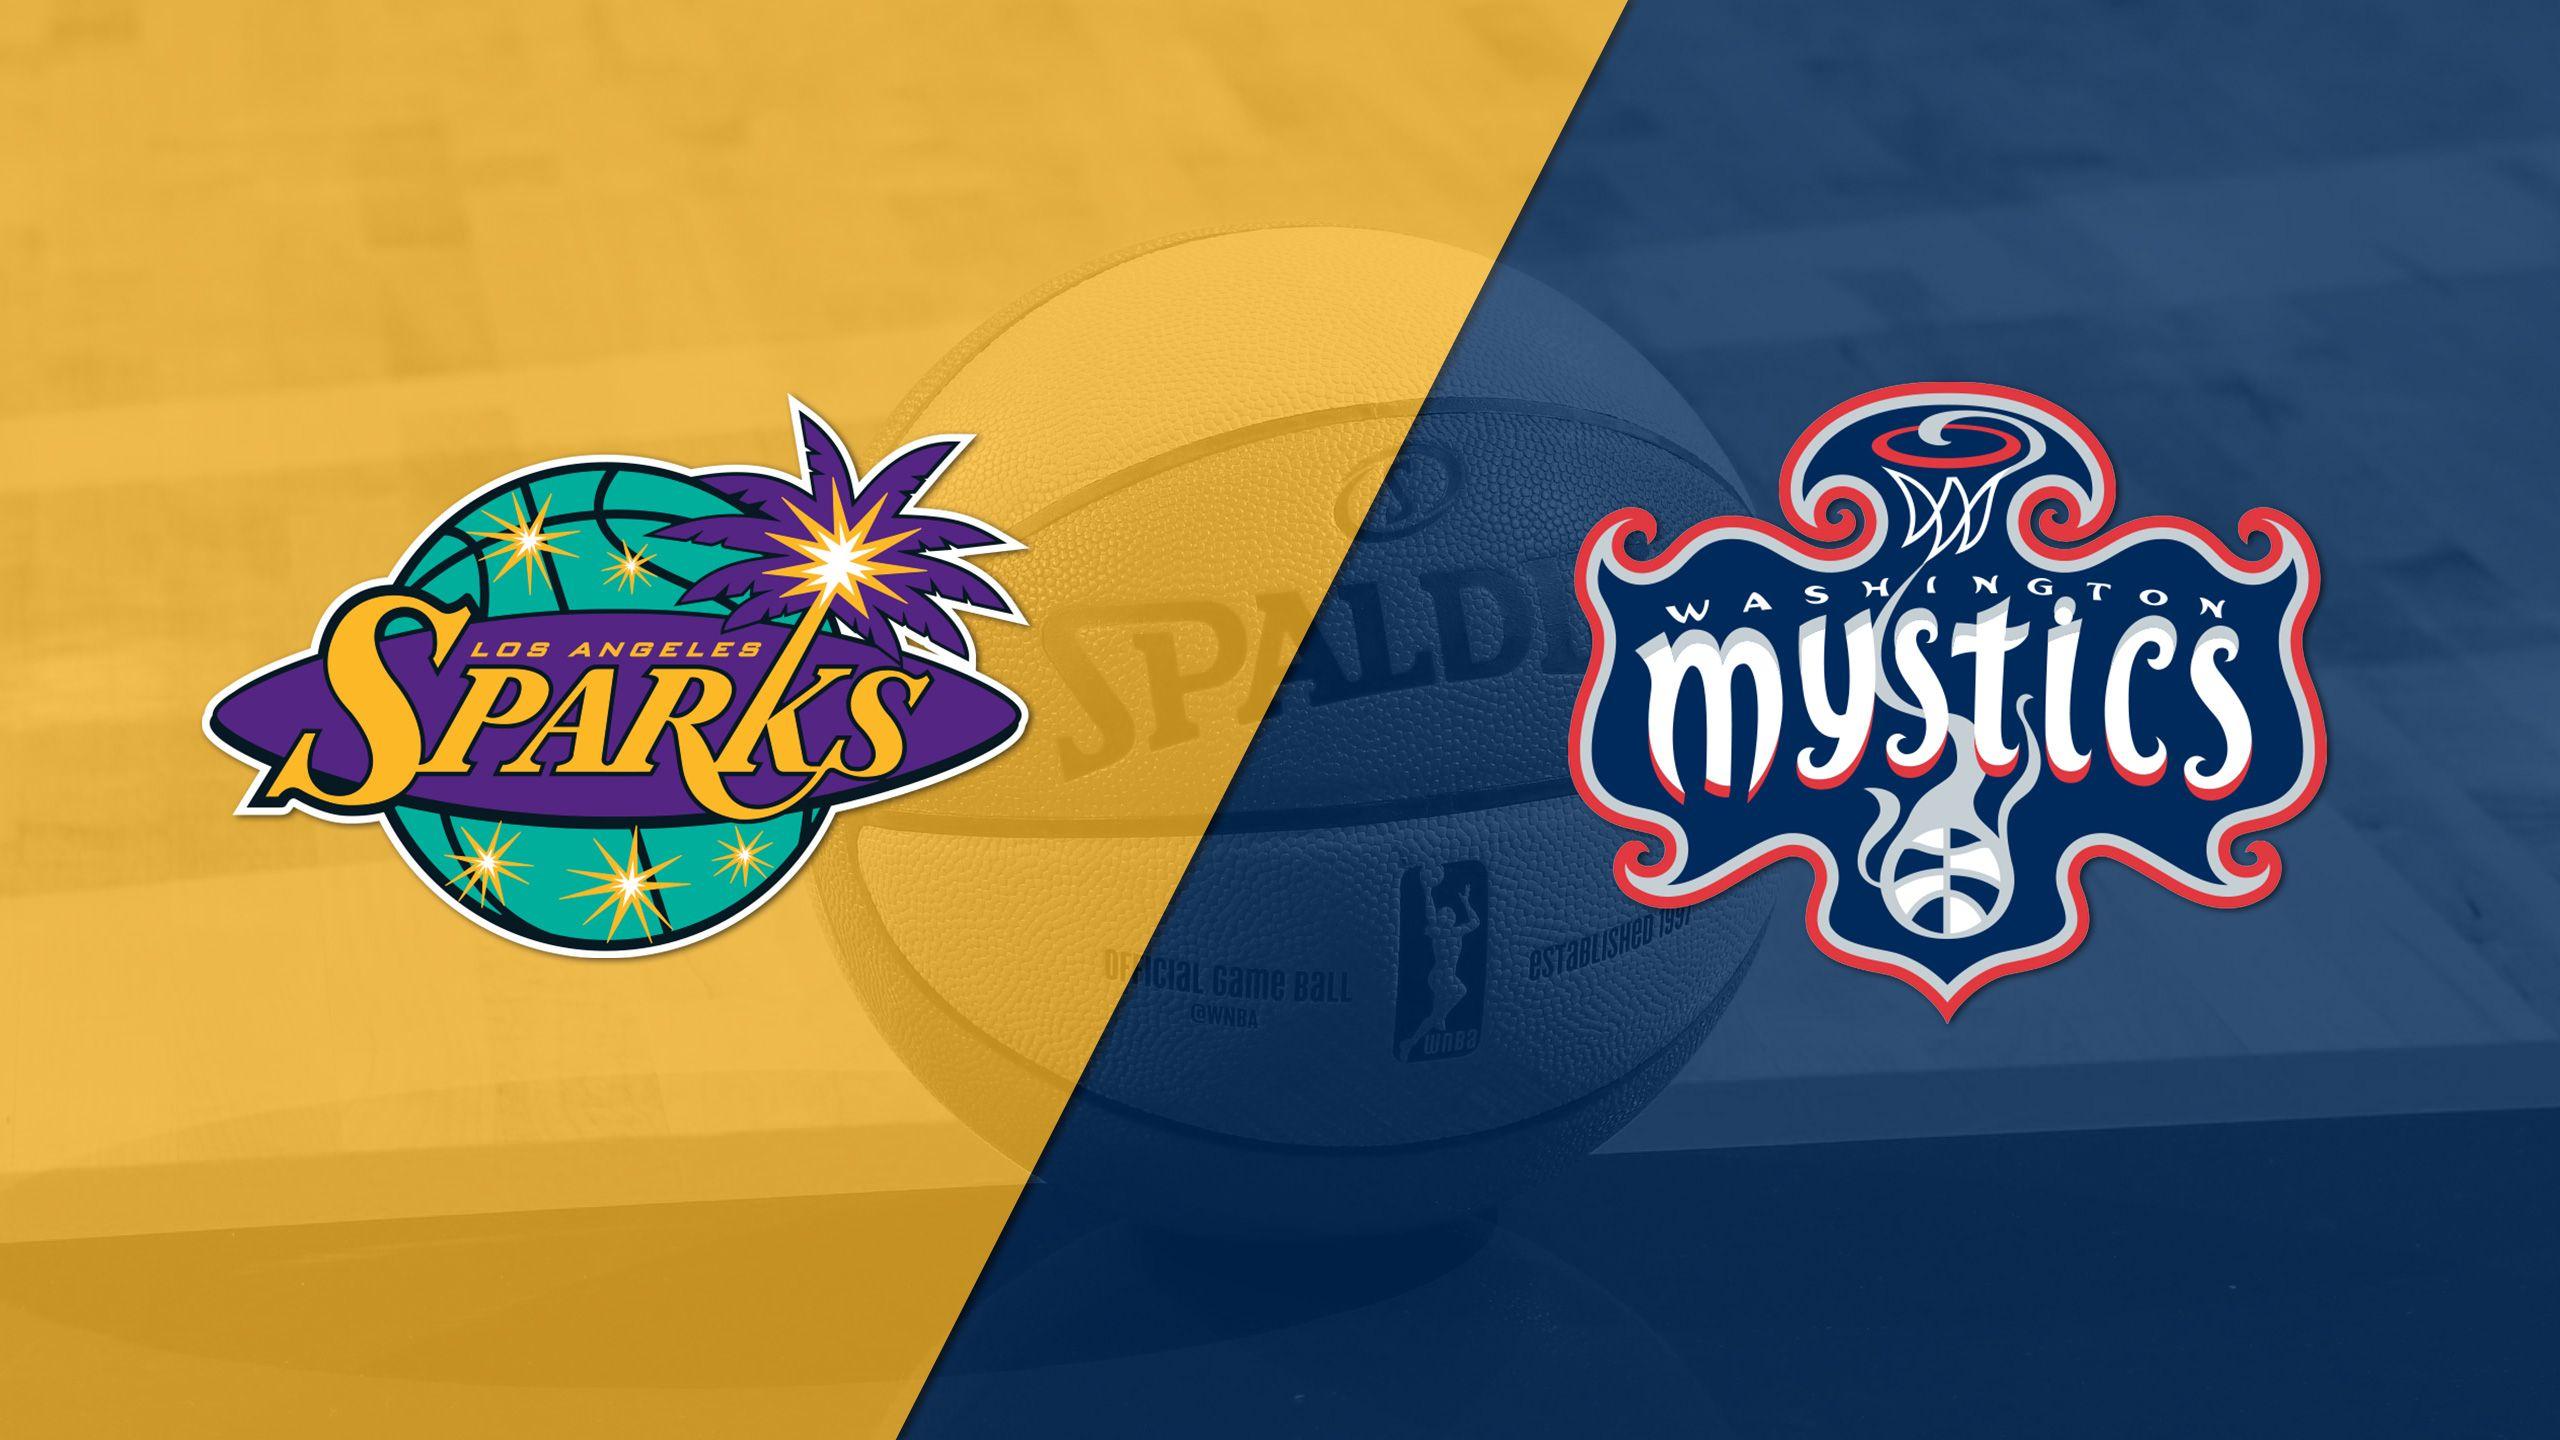 Los Angeles Sparks vs. Washington Mystics